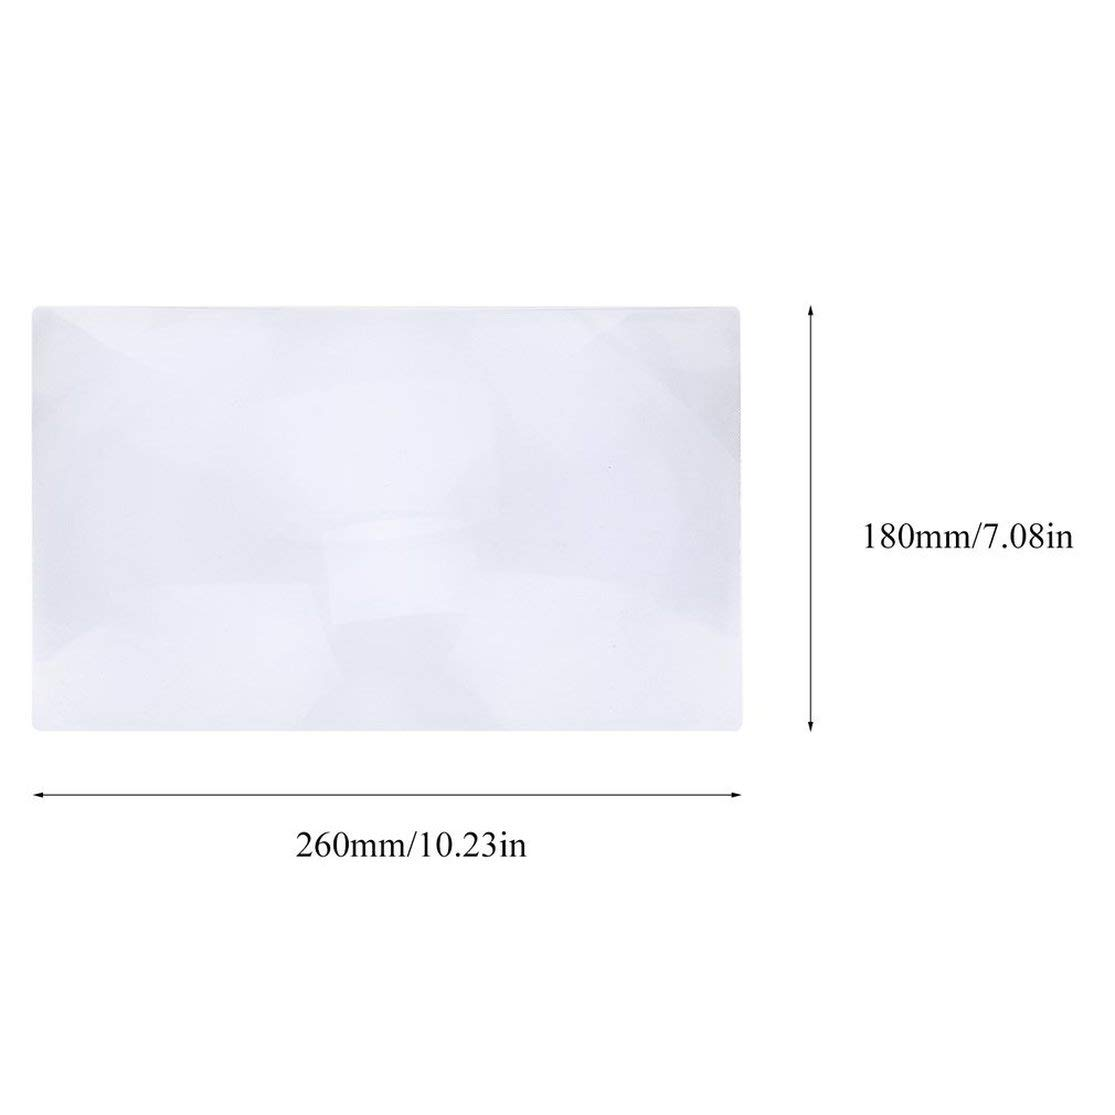 Lupa de aumento de tama/ño 3X XL de Portale Hoja de lupa de p/ágina completa Lente de Fresnel para leer Documento de peri/ódico Color:silvery